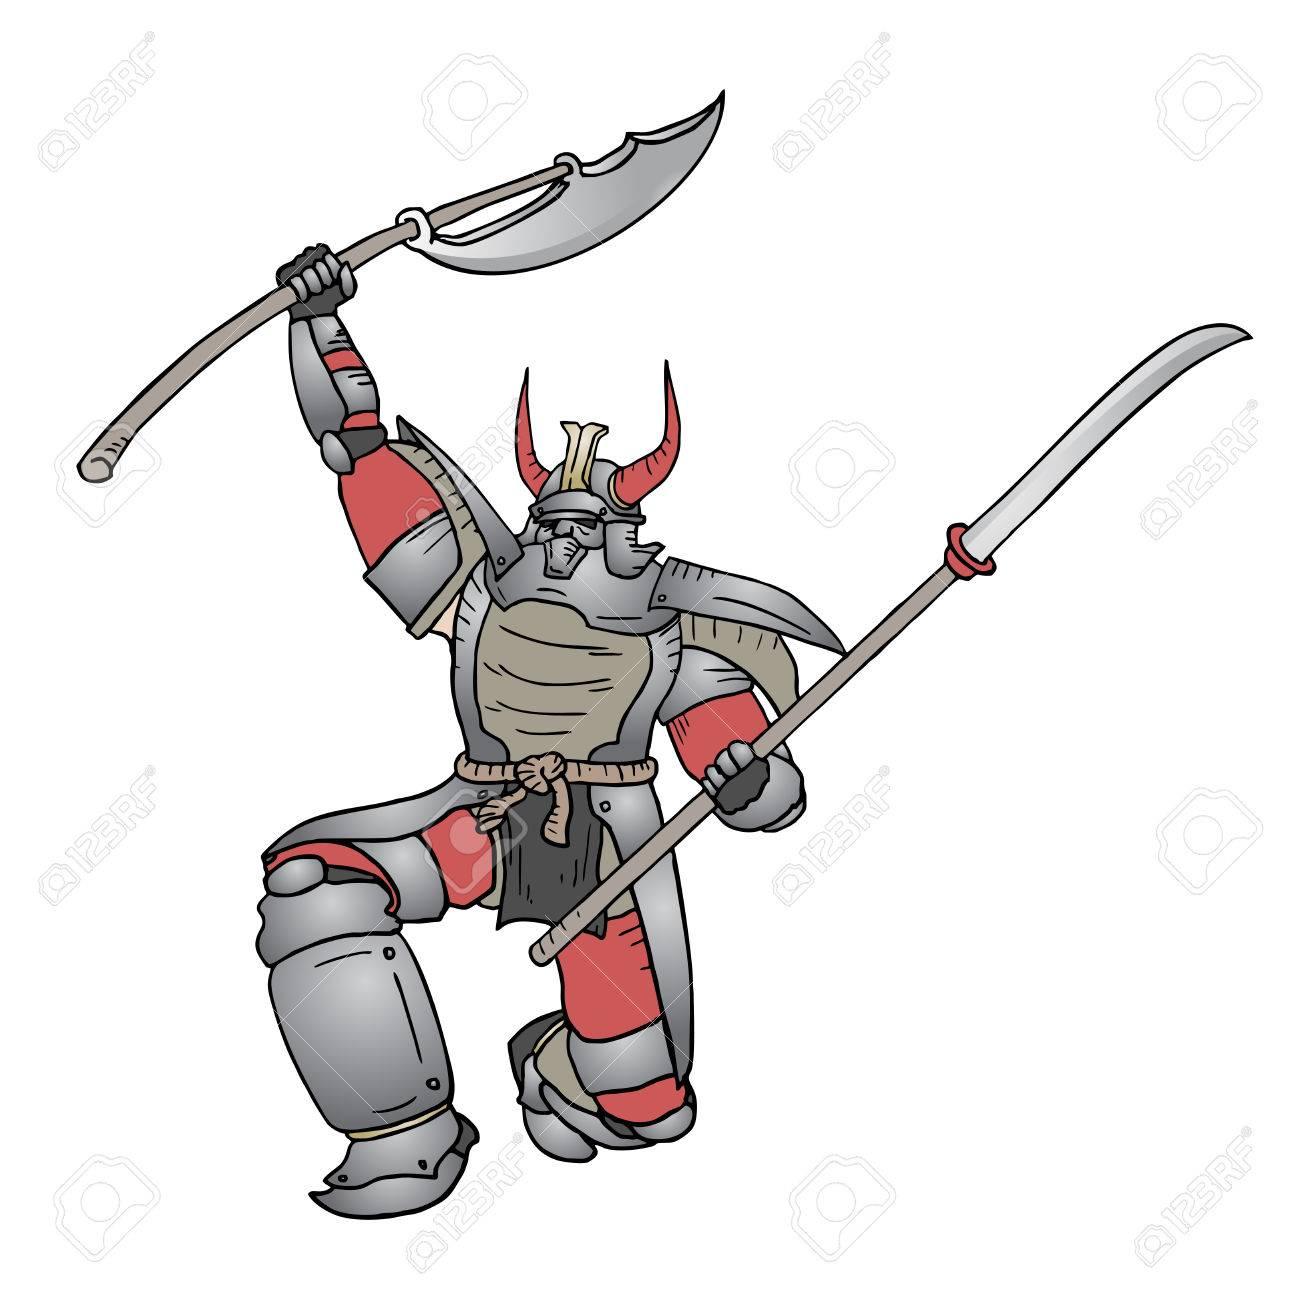 Shogun clipart clip art Shogun Cliparts 16 - 1300 X 1300 - Making-The-Web.com clip art